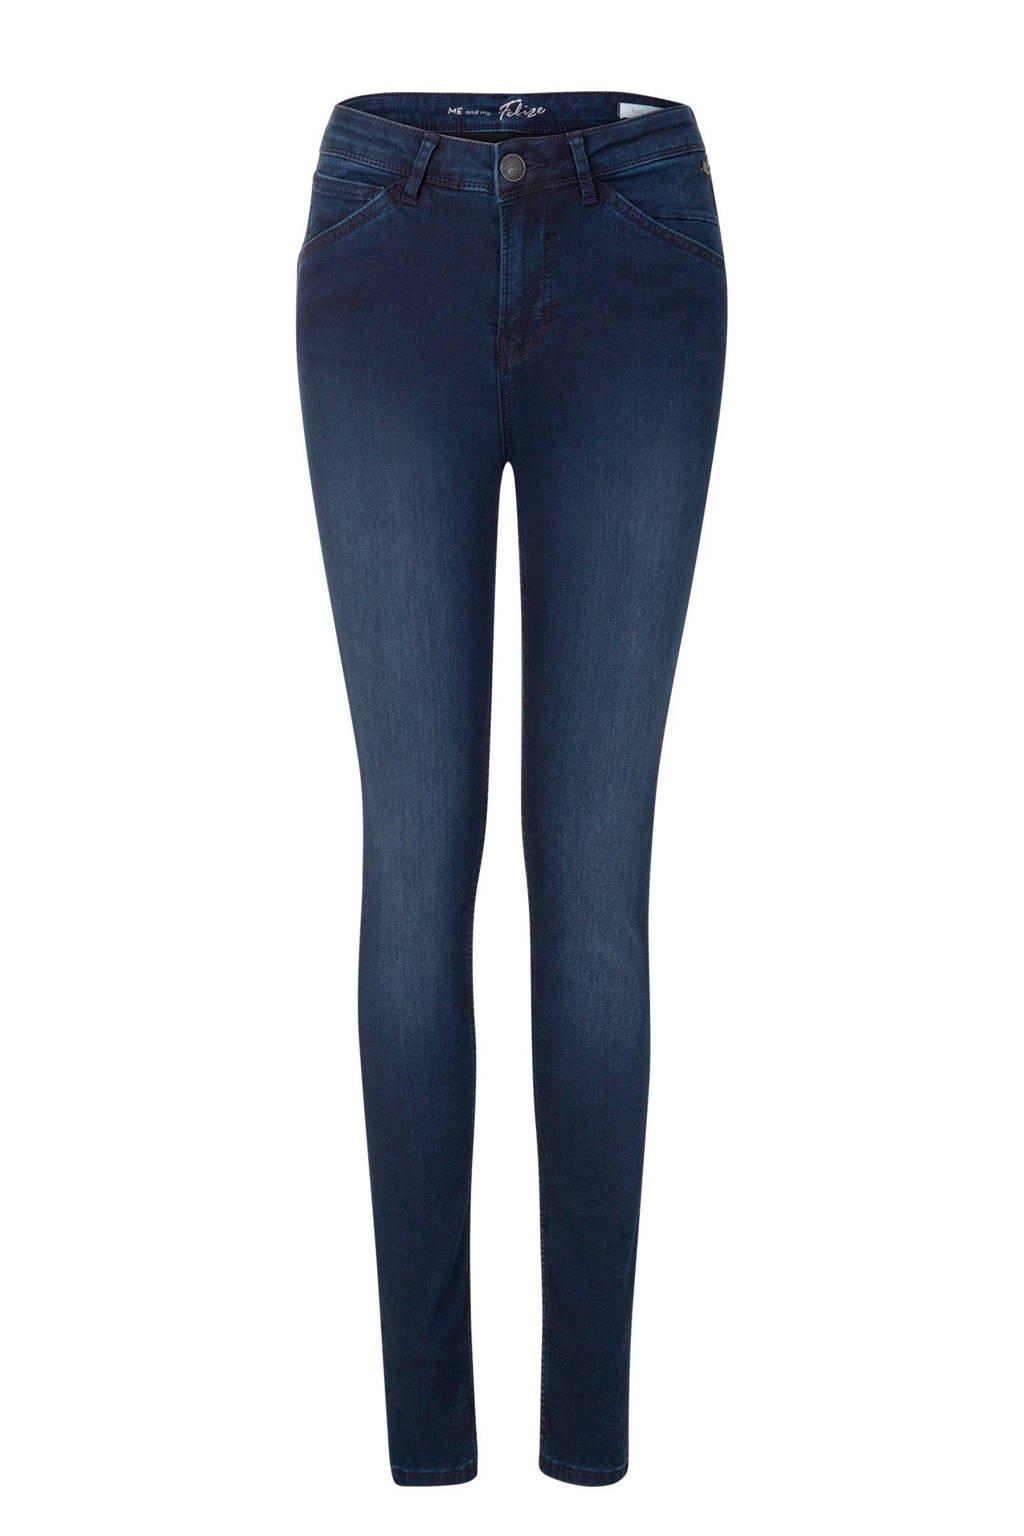 Miss Etam Lang high rise skinny jeans, Donkerblauw